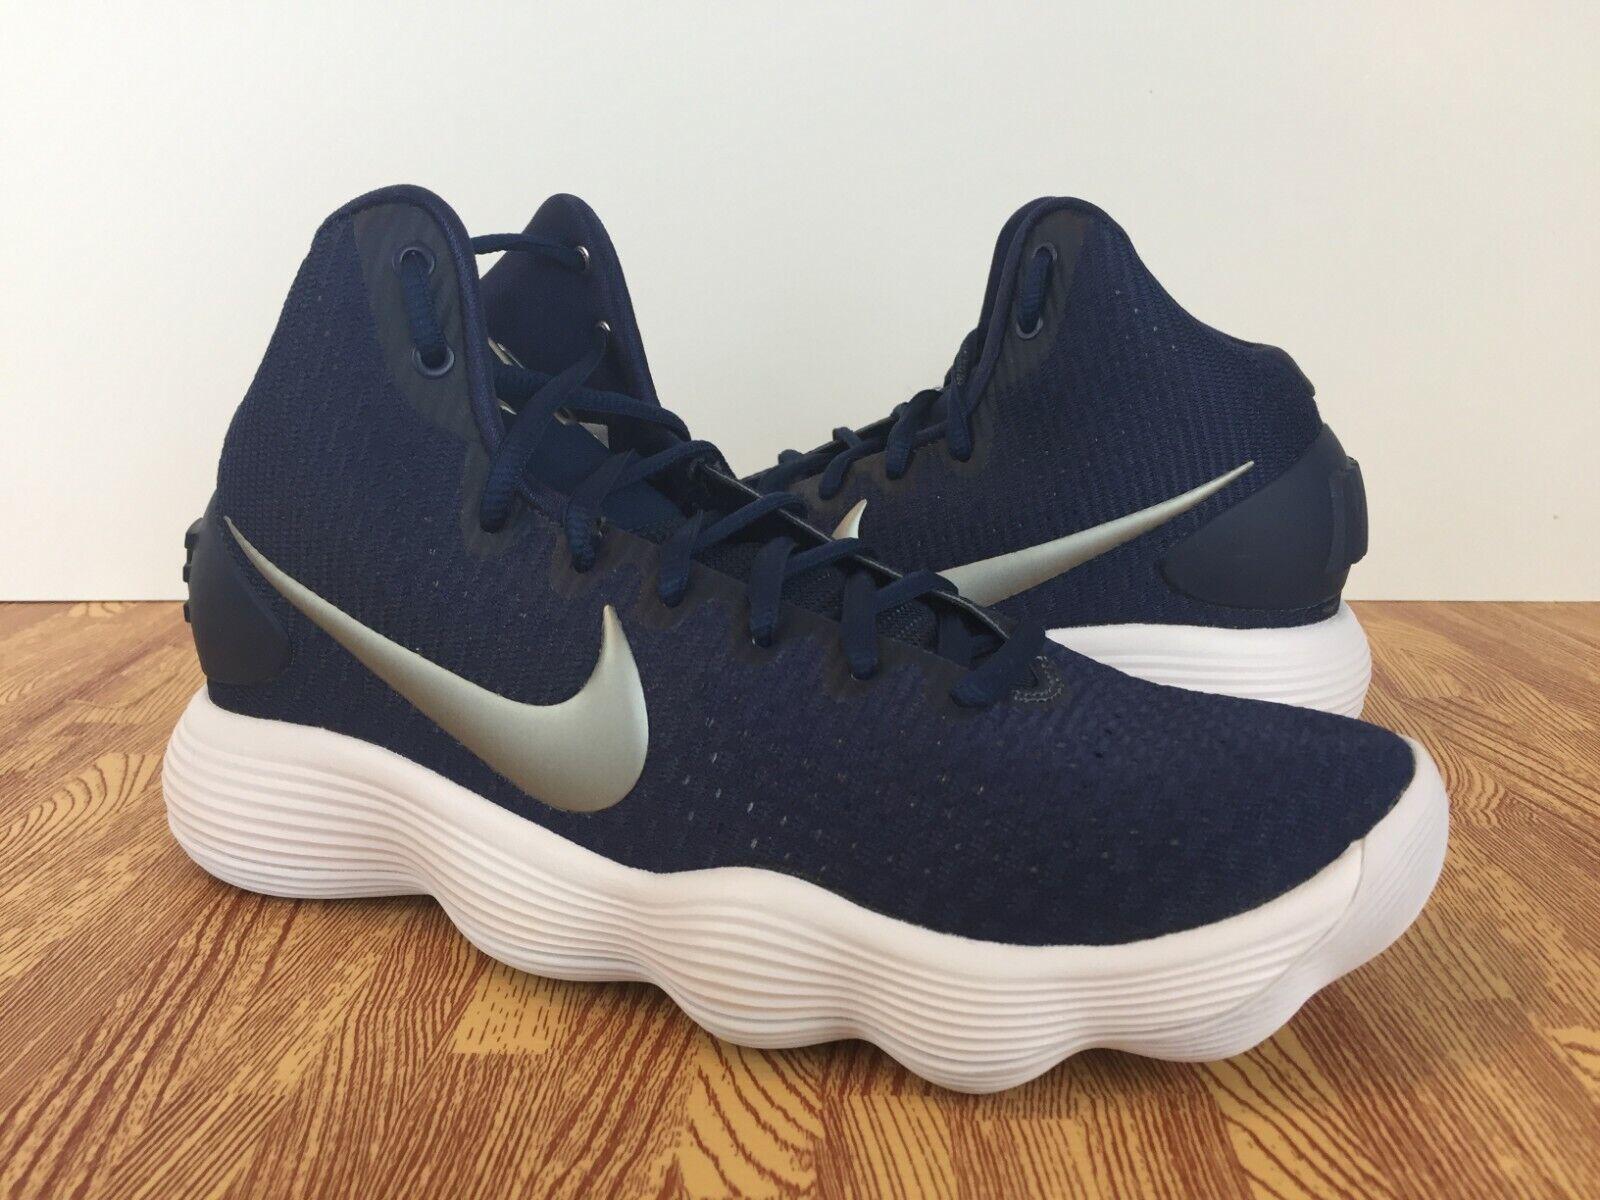 Nike Hyperdunk 2017 TB Men's Basketball shoes 897808-400 Midnight Navy SIZE 7